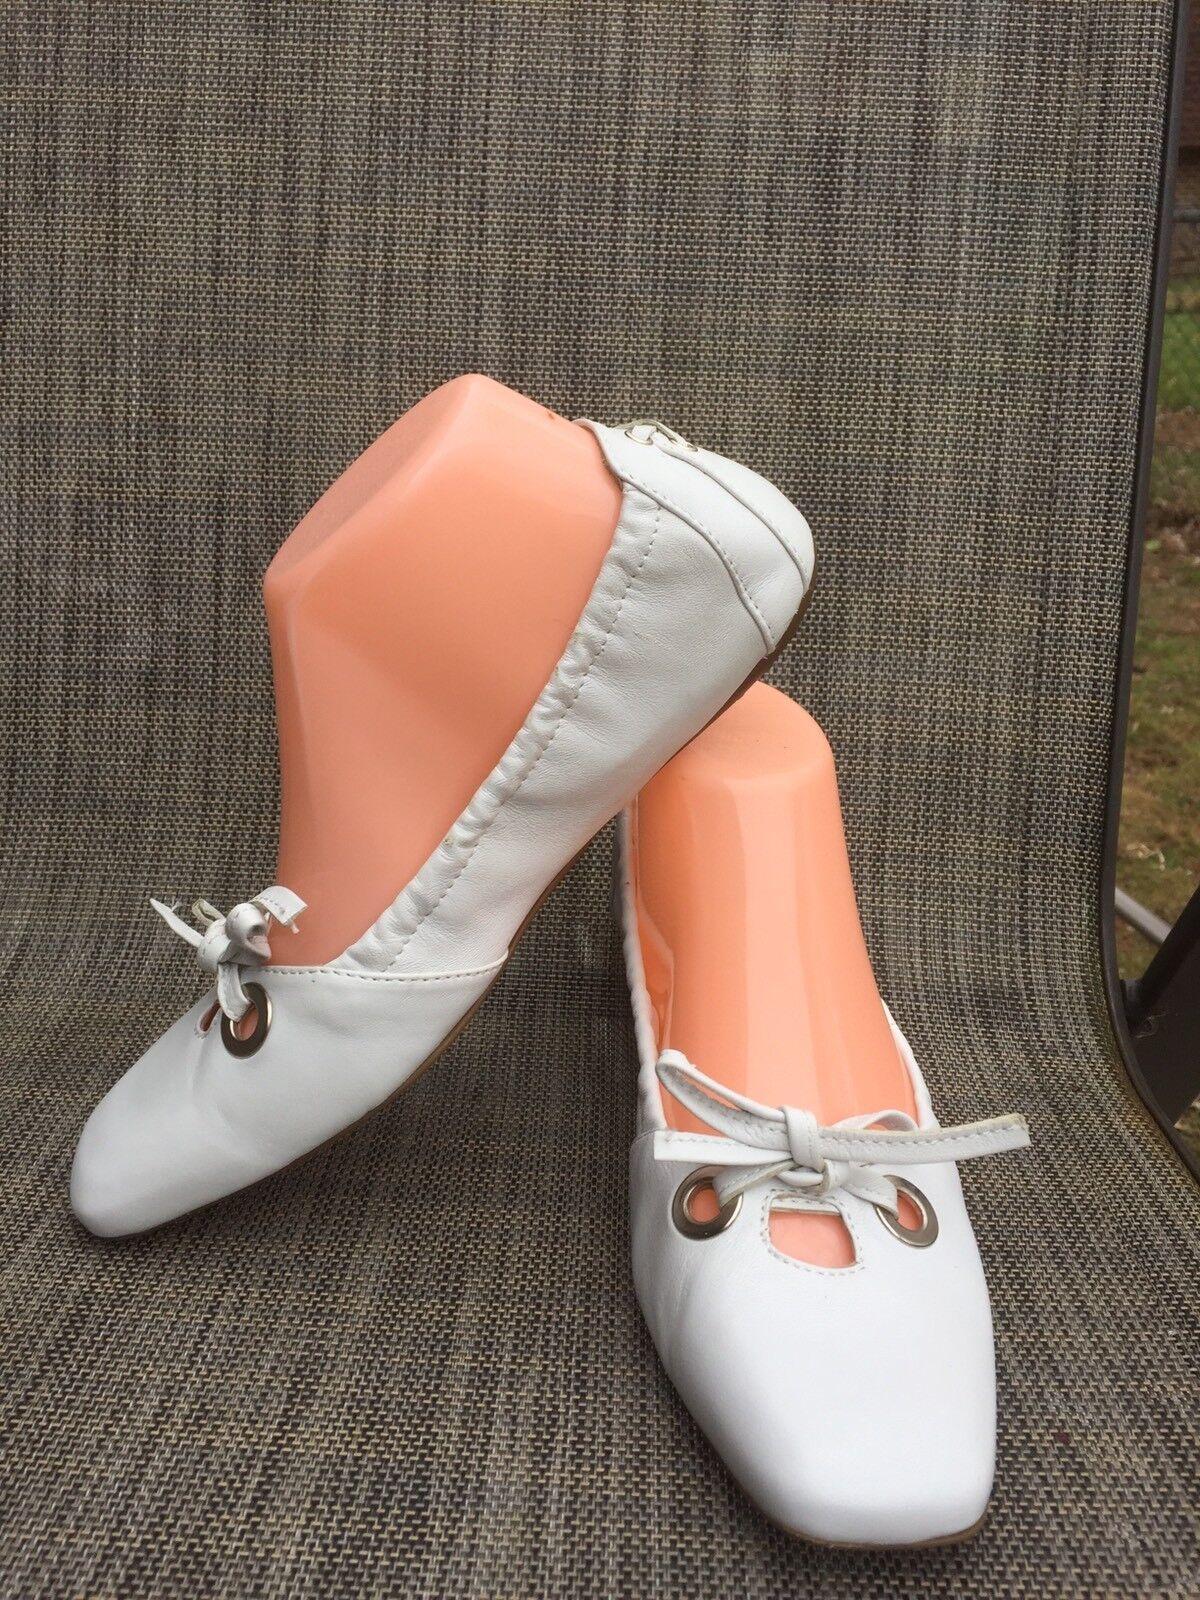 Rare Leder STOKTON Damens's Weiß Leder Rare Ballet Flat sz.37.5/7-7.5US w/bow, f7e1f8